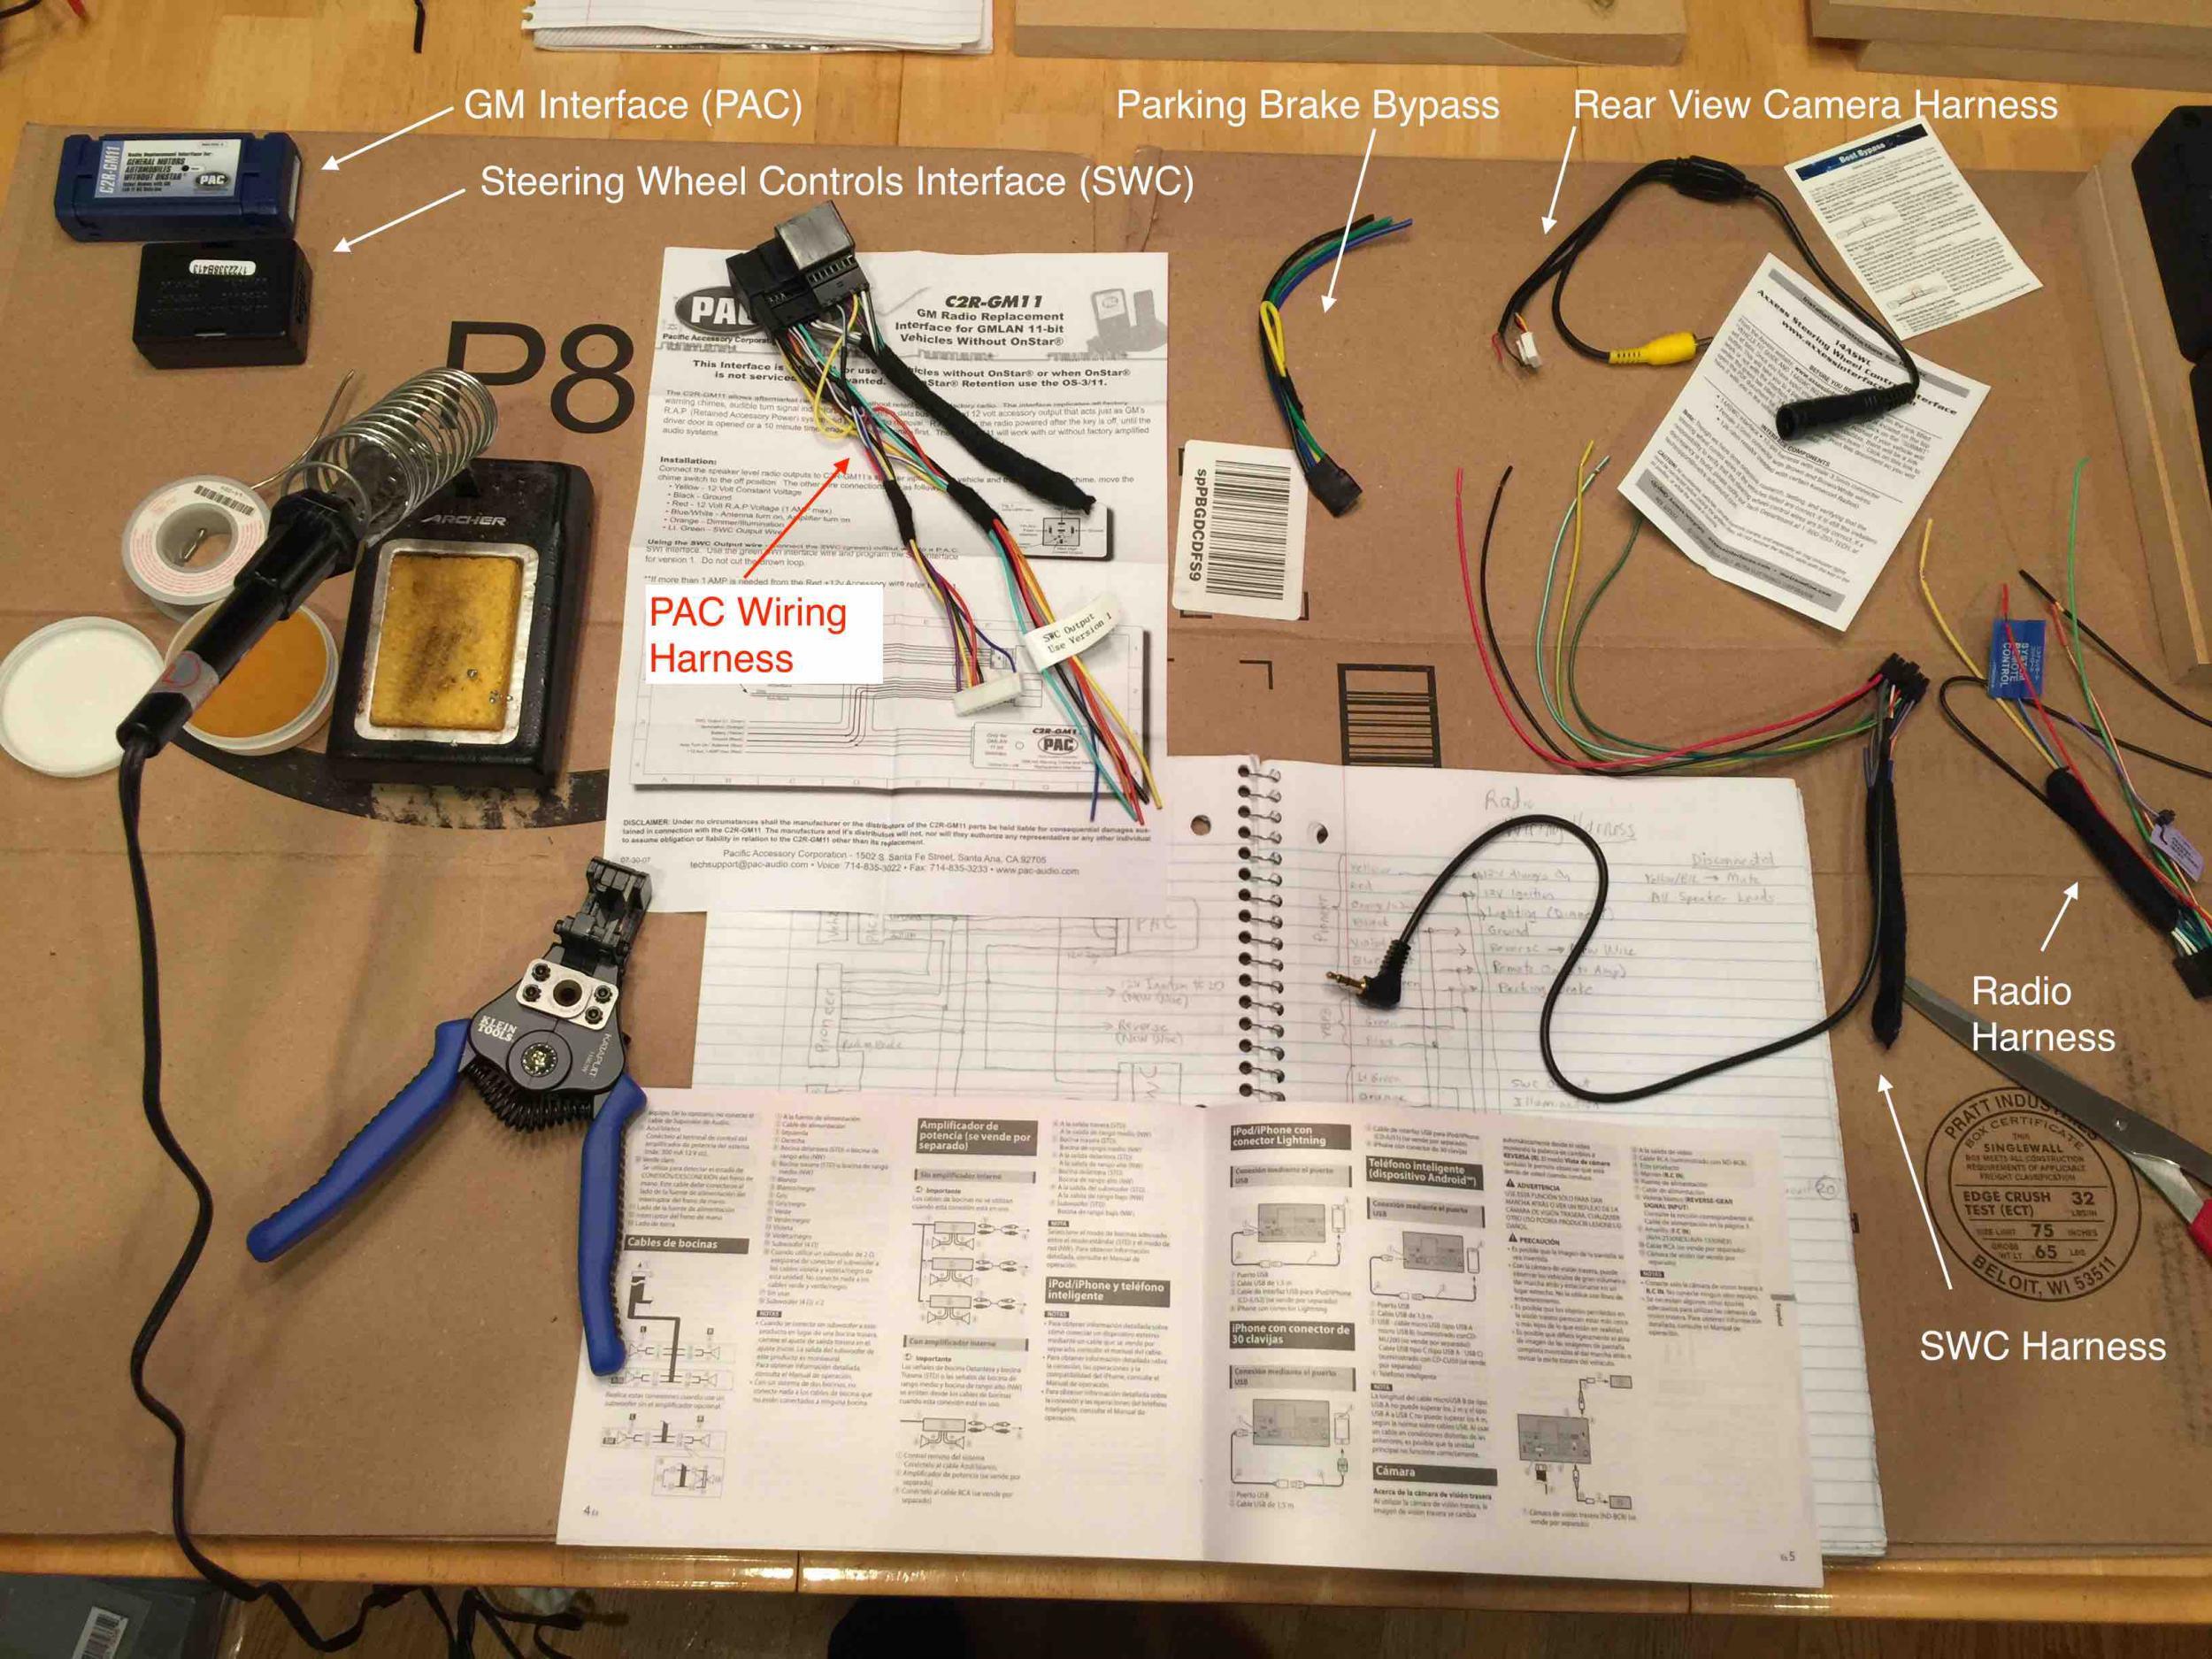 Attachments Pontiac Solstice Forum Onstar Wiring Harness Setup